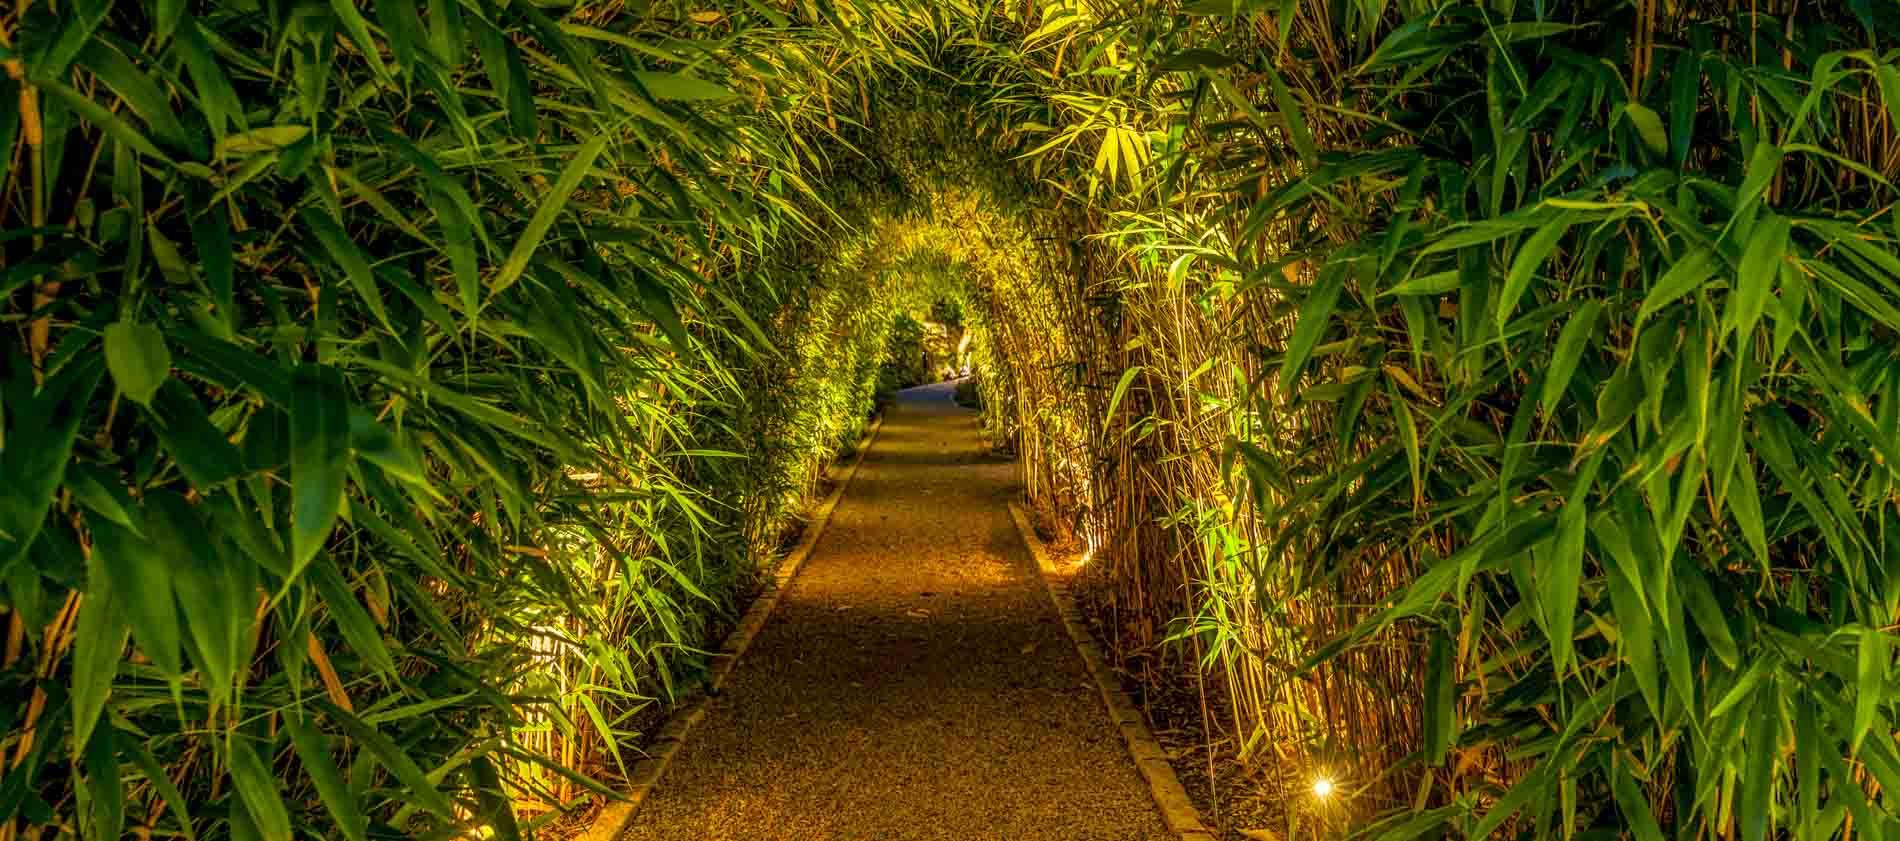 Bamboo-garden-tunnel-ireland